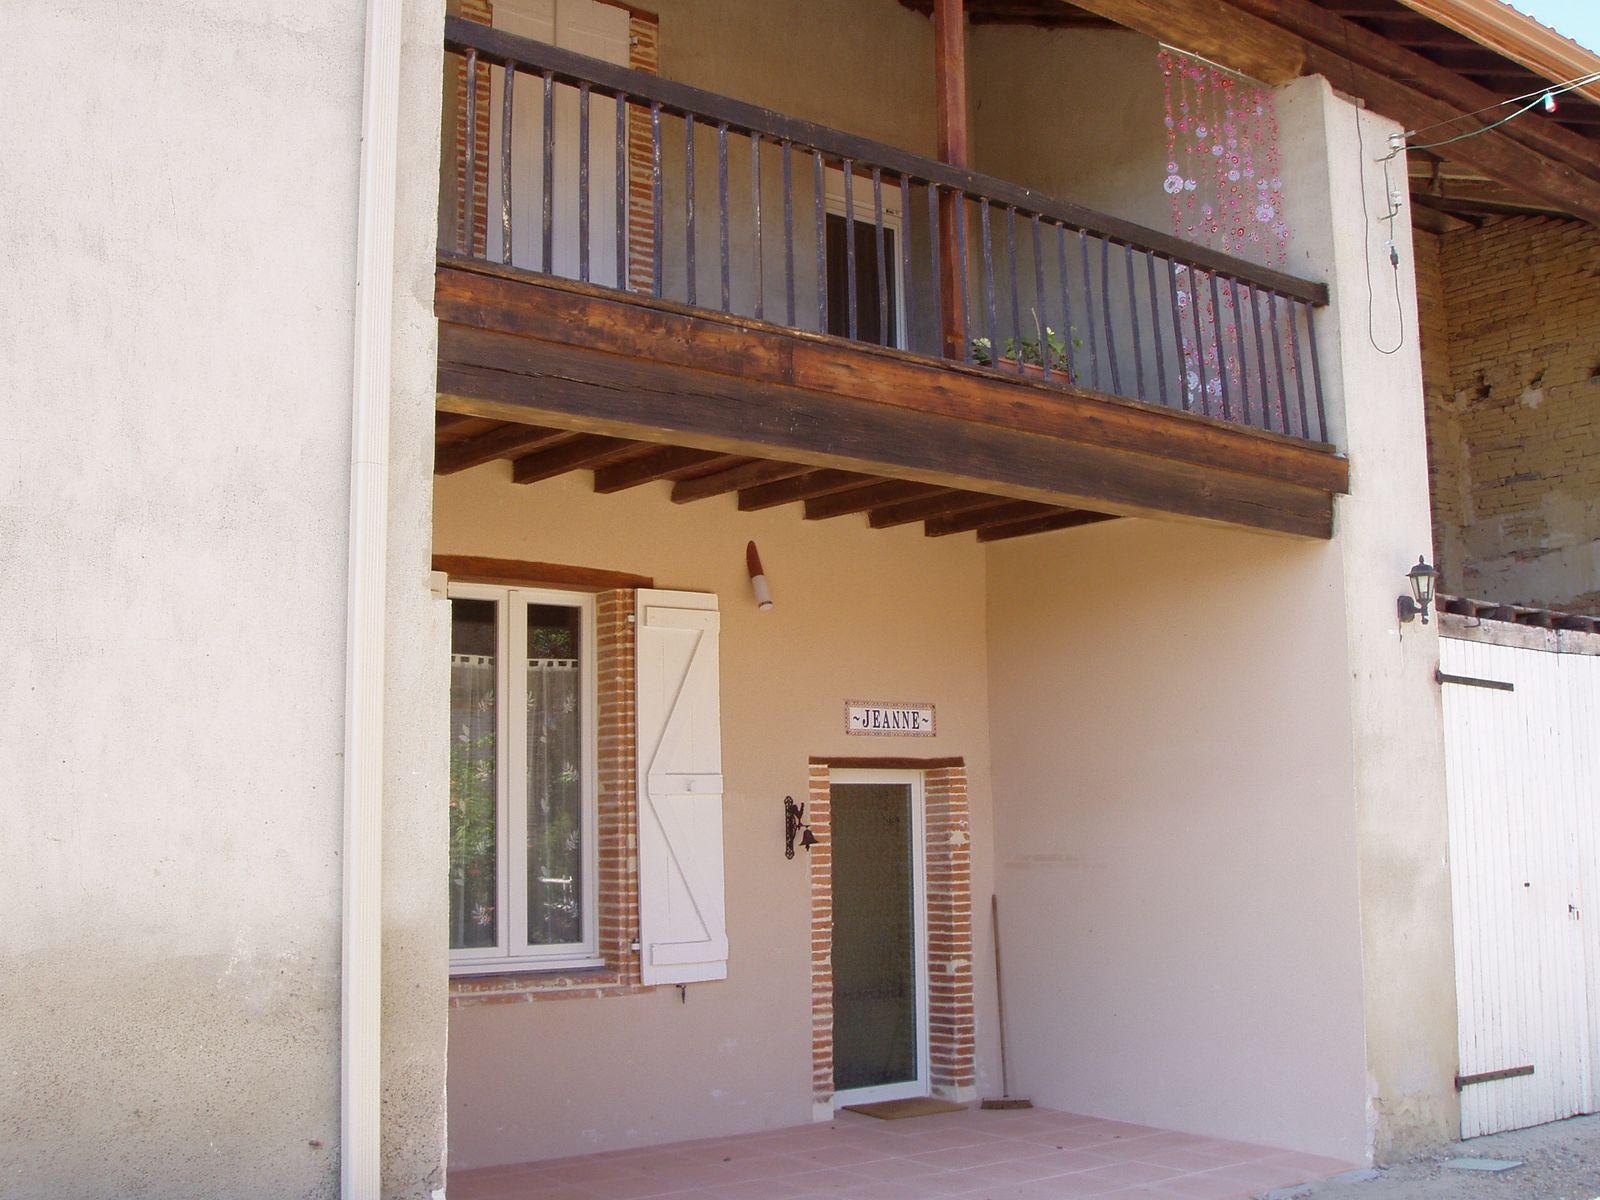 Entrée et balcon